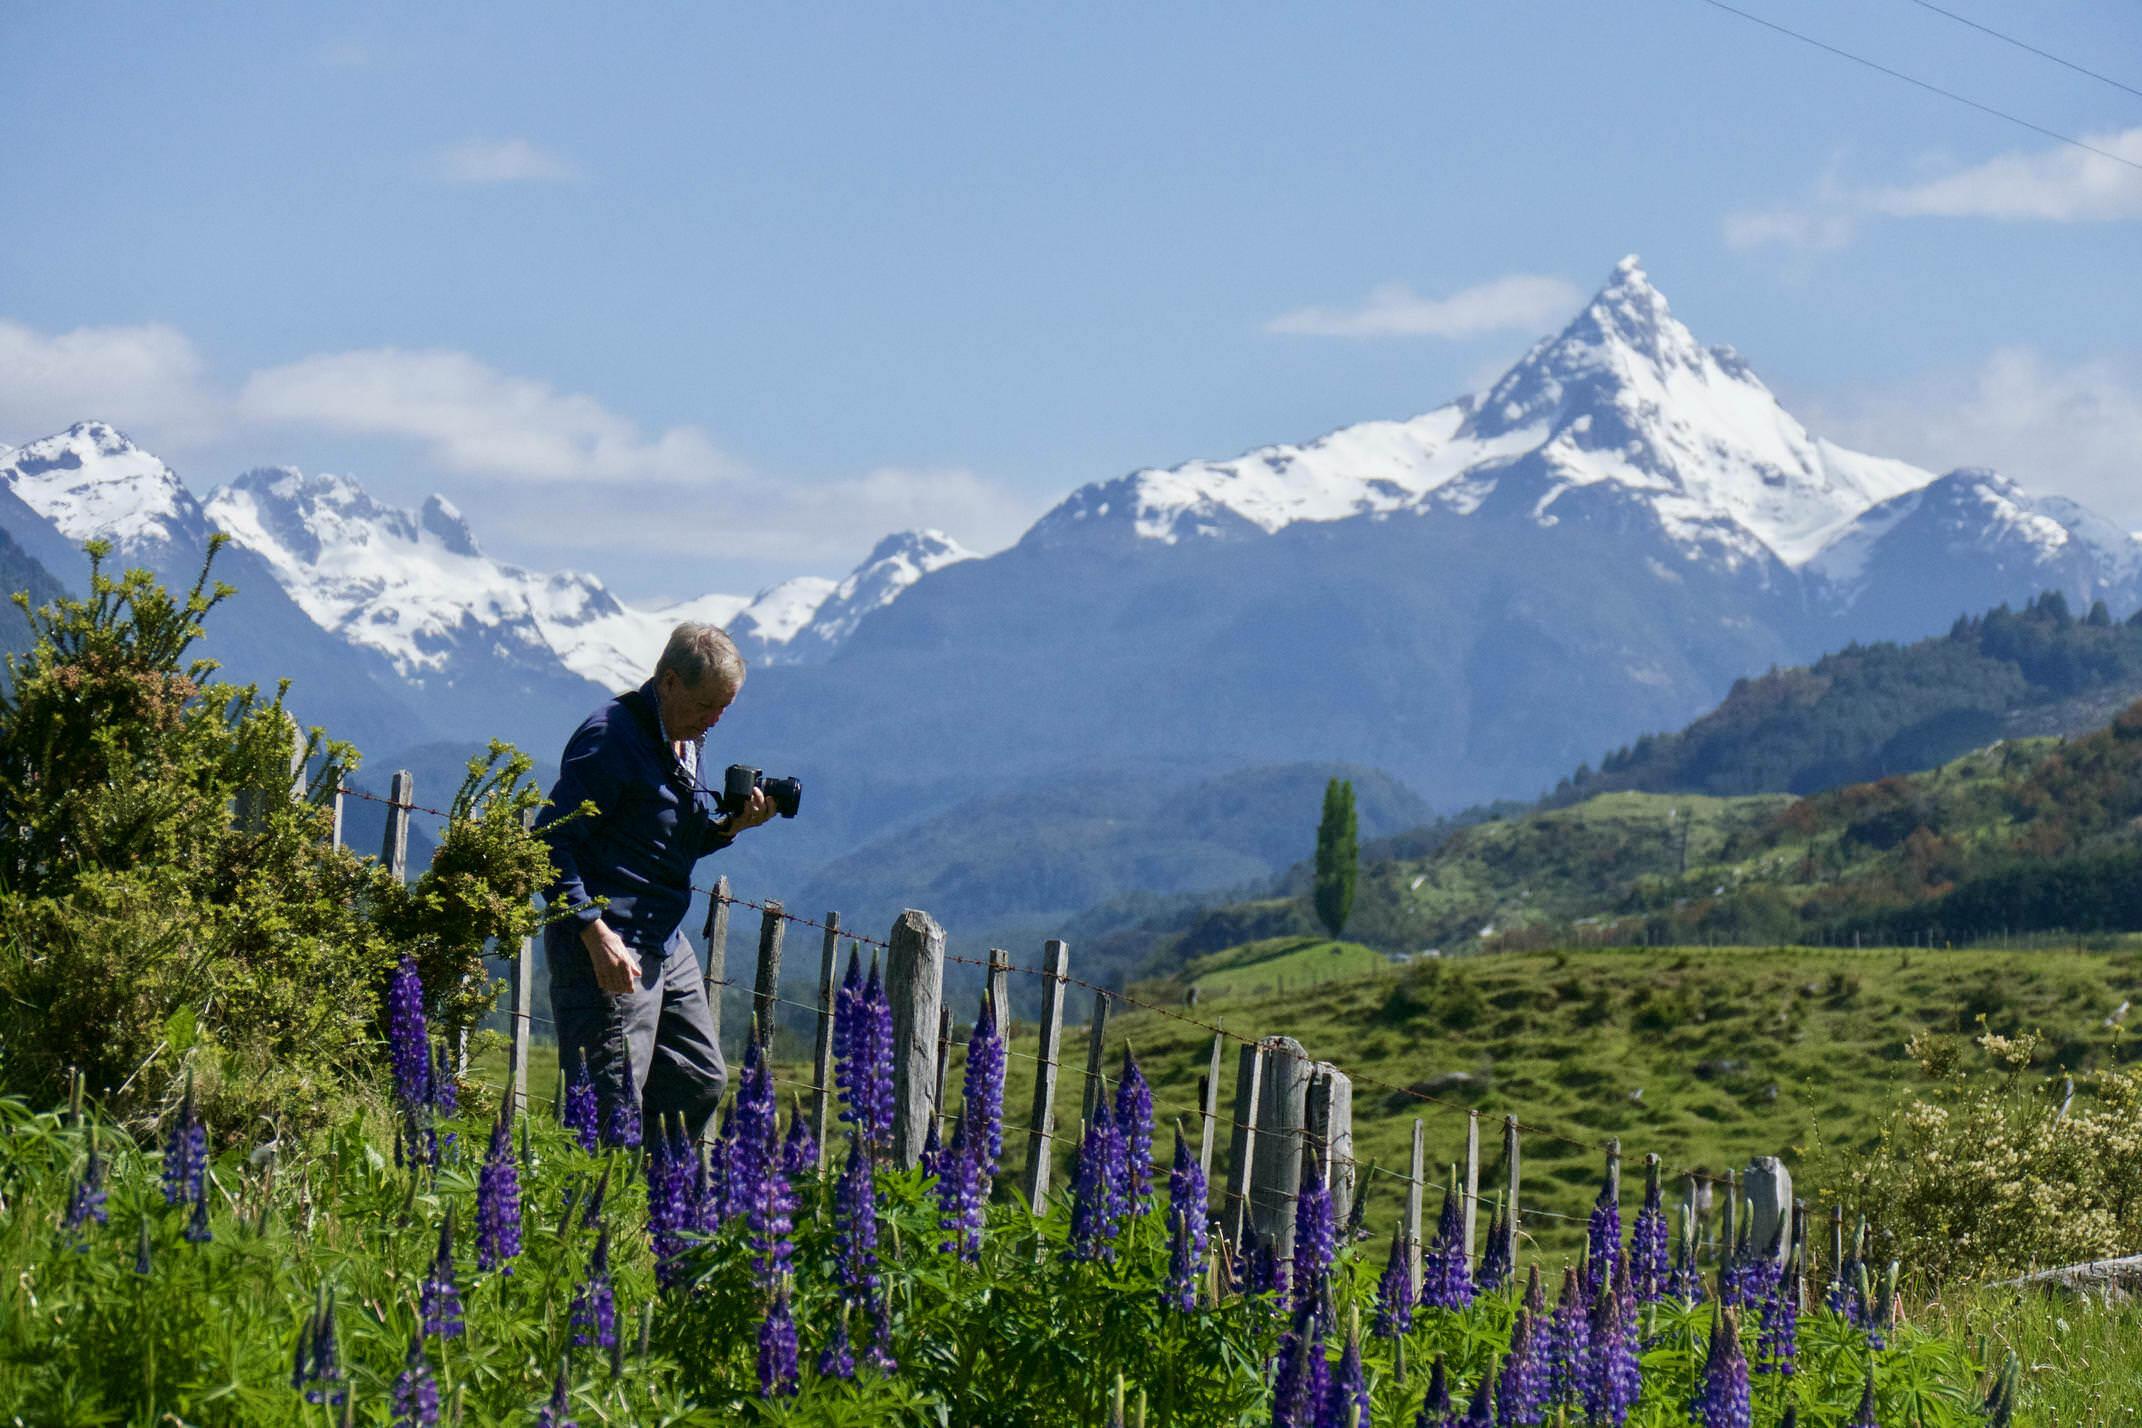 Chile patagonia carretera austral north of coyhaique photographer volcano